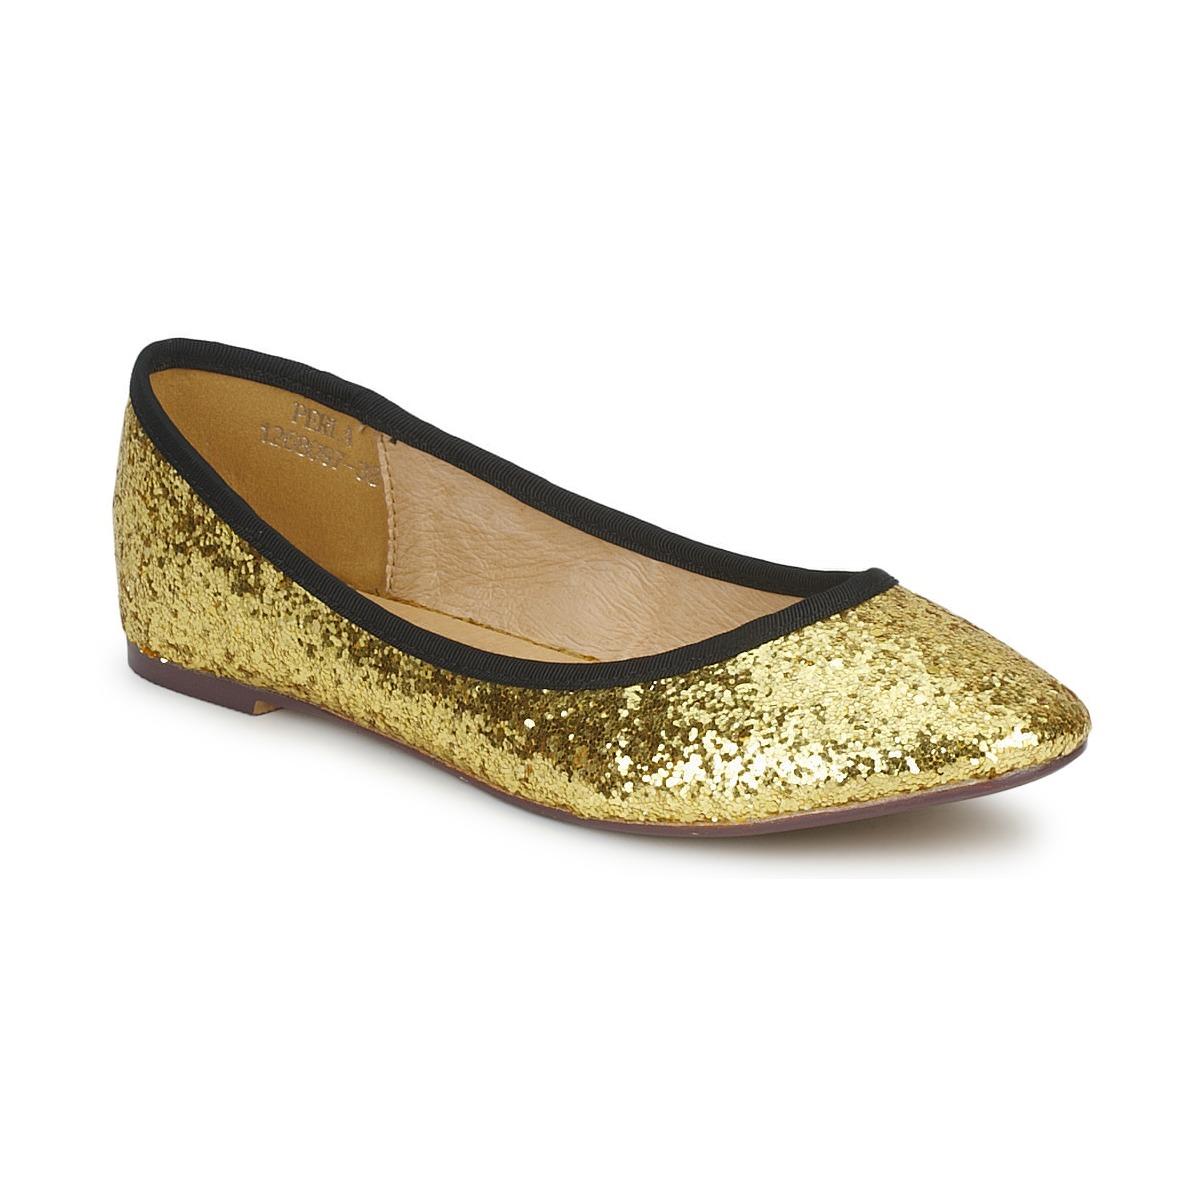 Friis & Company PERLA Goldfarben - Kostenloser Versand bei Spartoode ! - Schuhe Ballerinas Damen 32,00 €